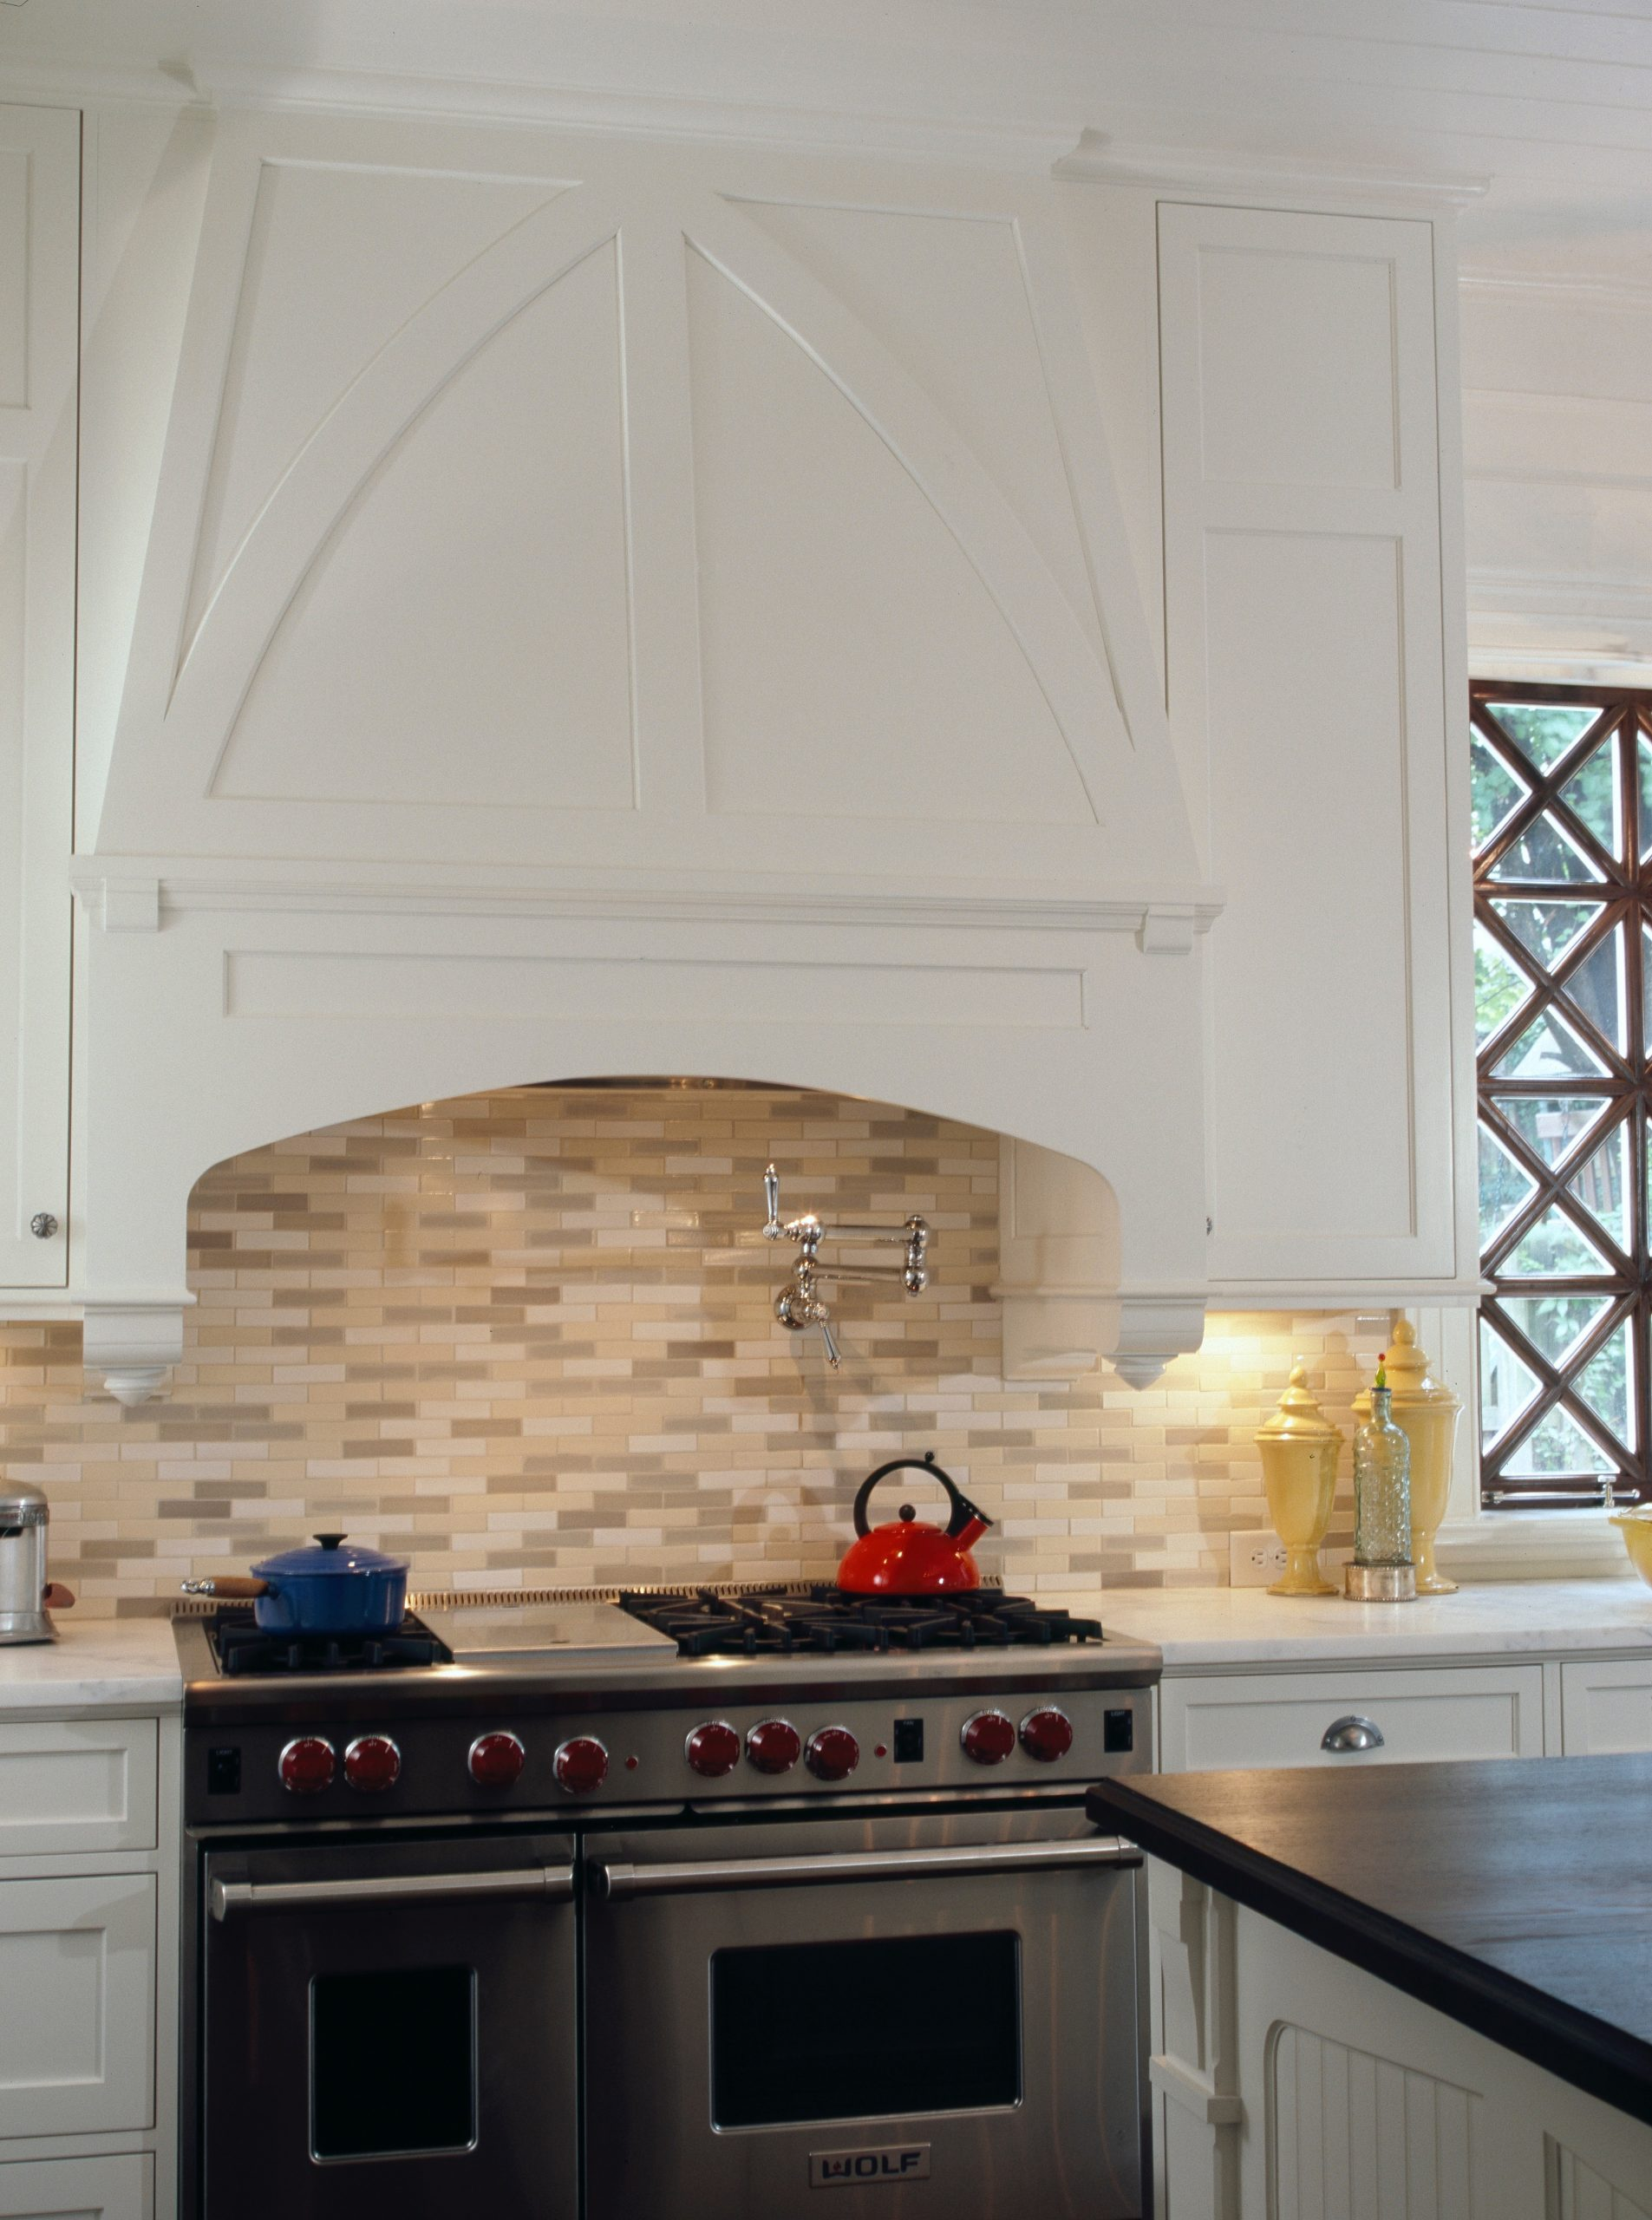 5 M kitchen range hood